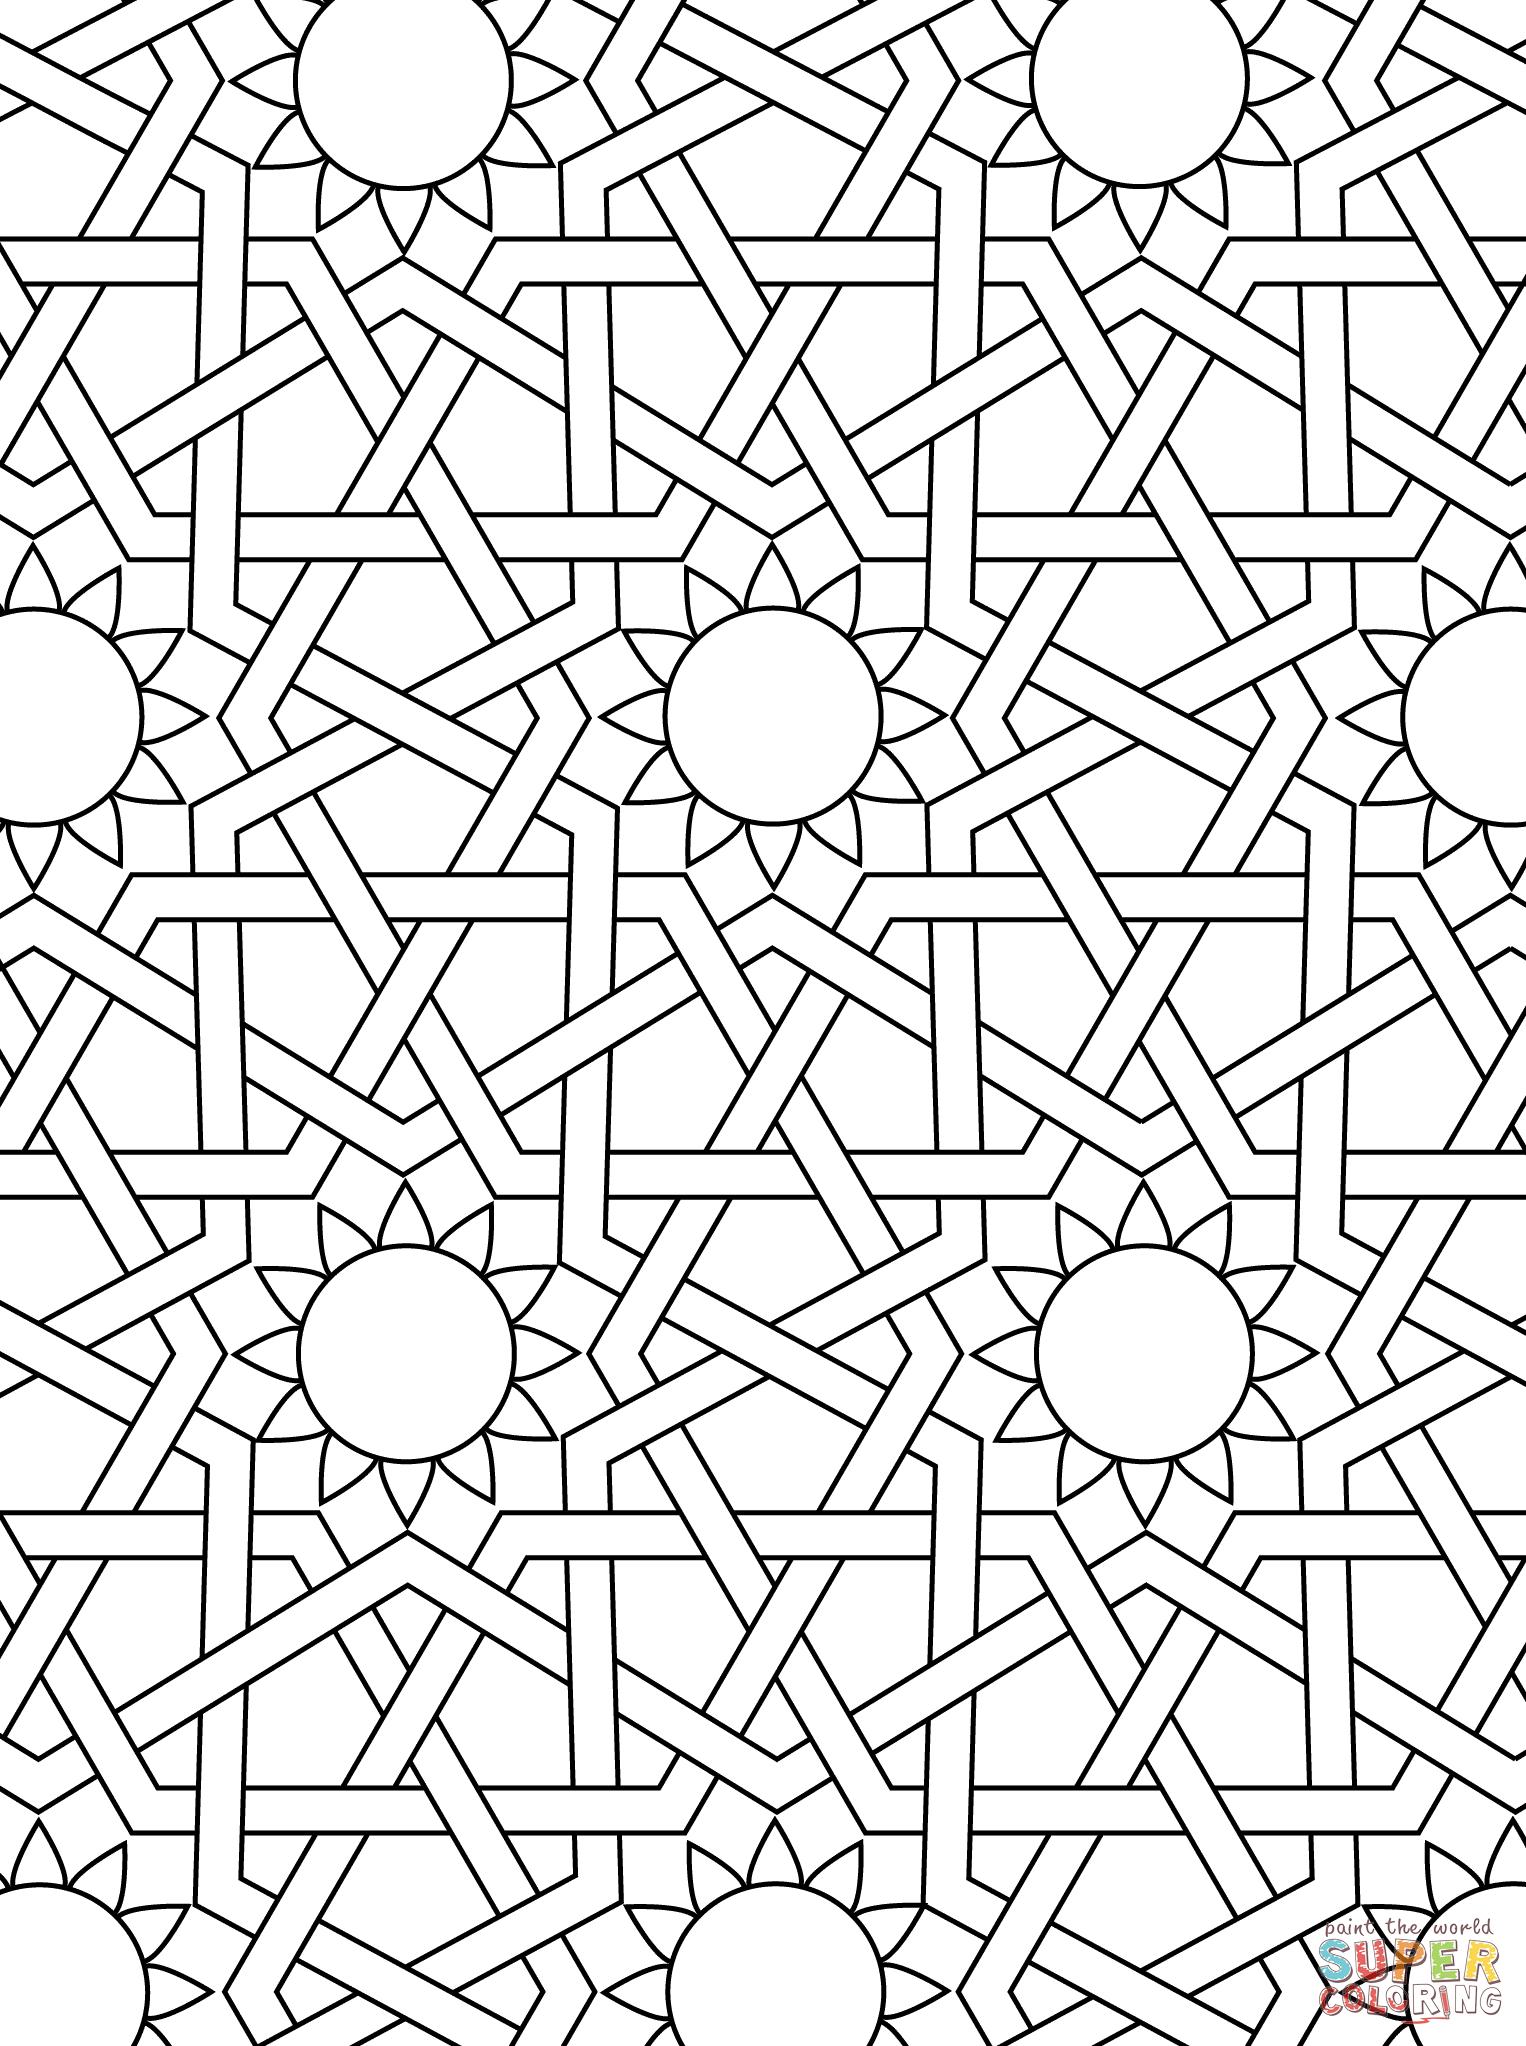 Islamic Ornament Mosaic Super Coloring Geometric Coloring Pages Islamic Patterns Islamic Mosaic